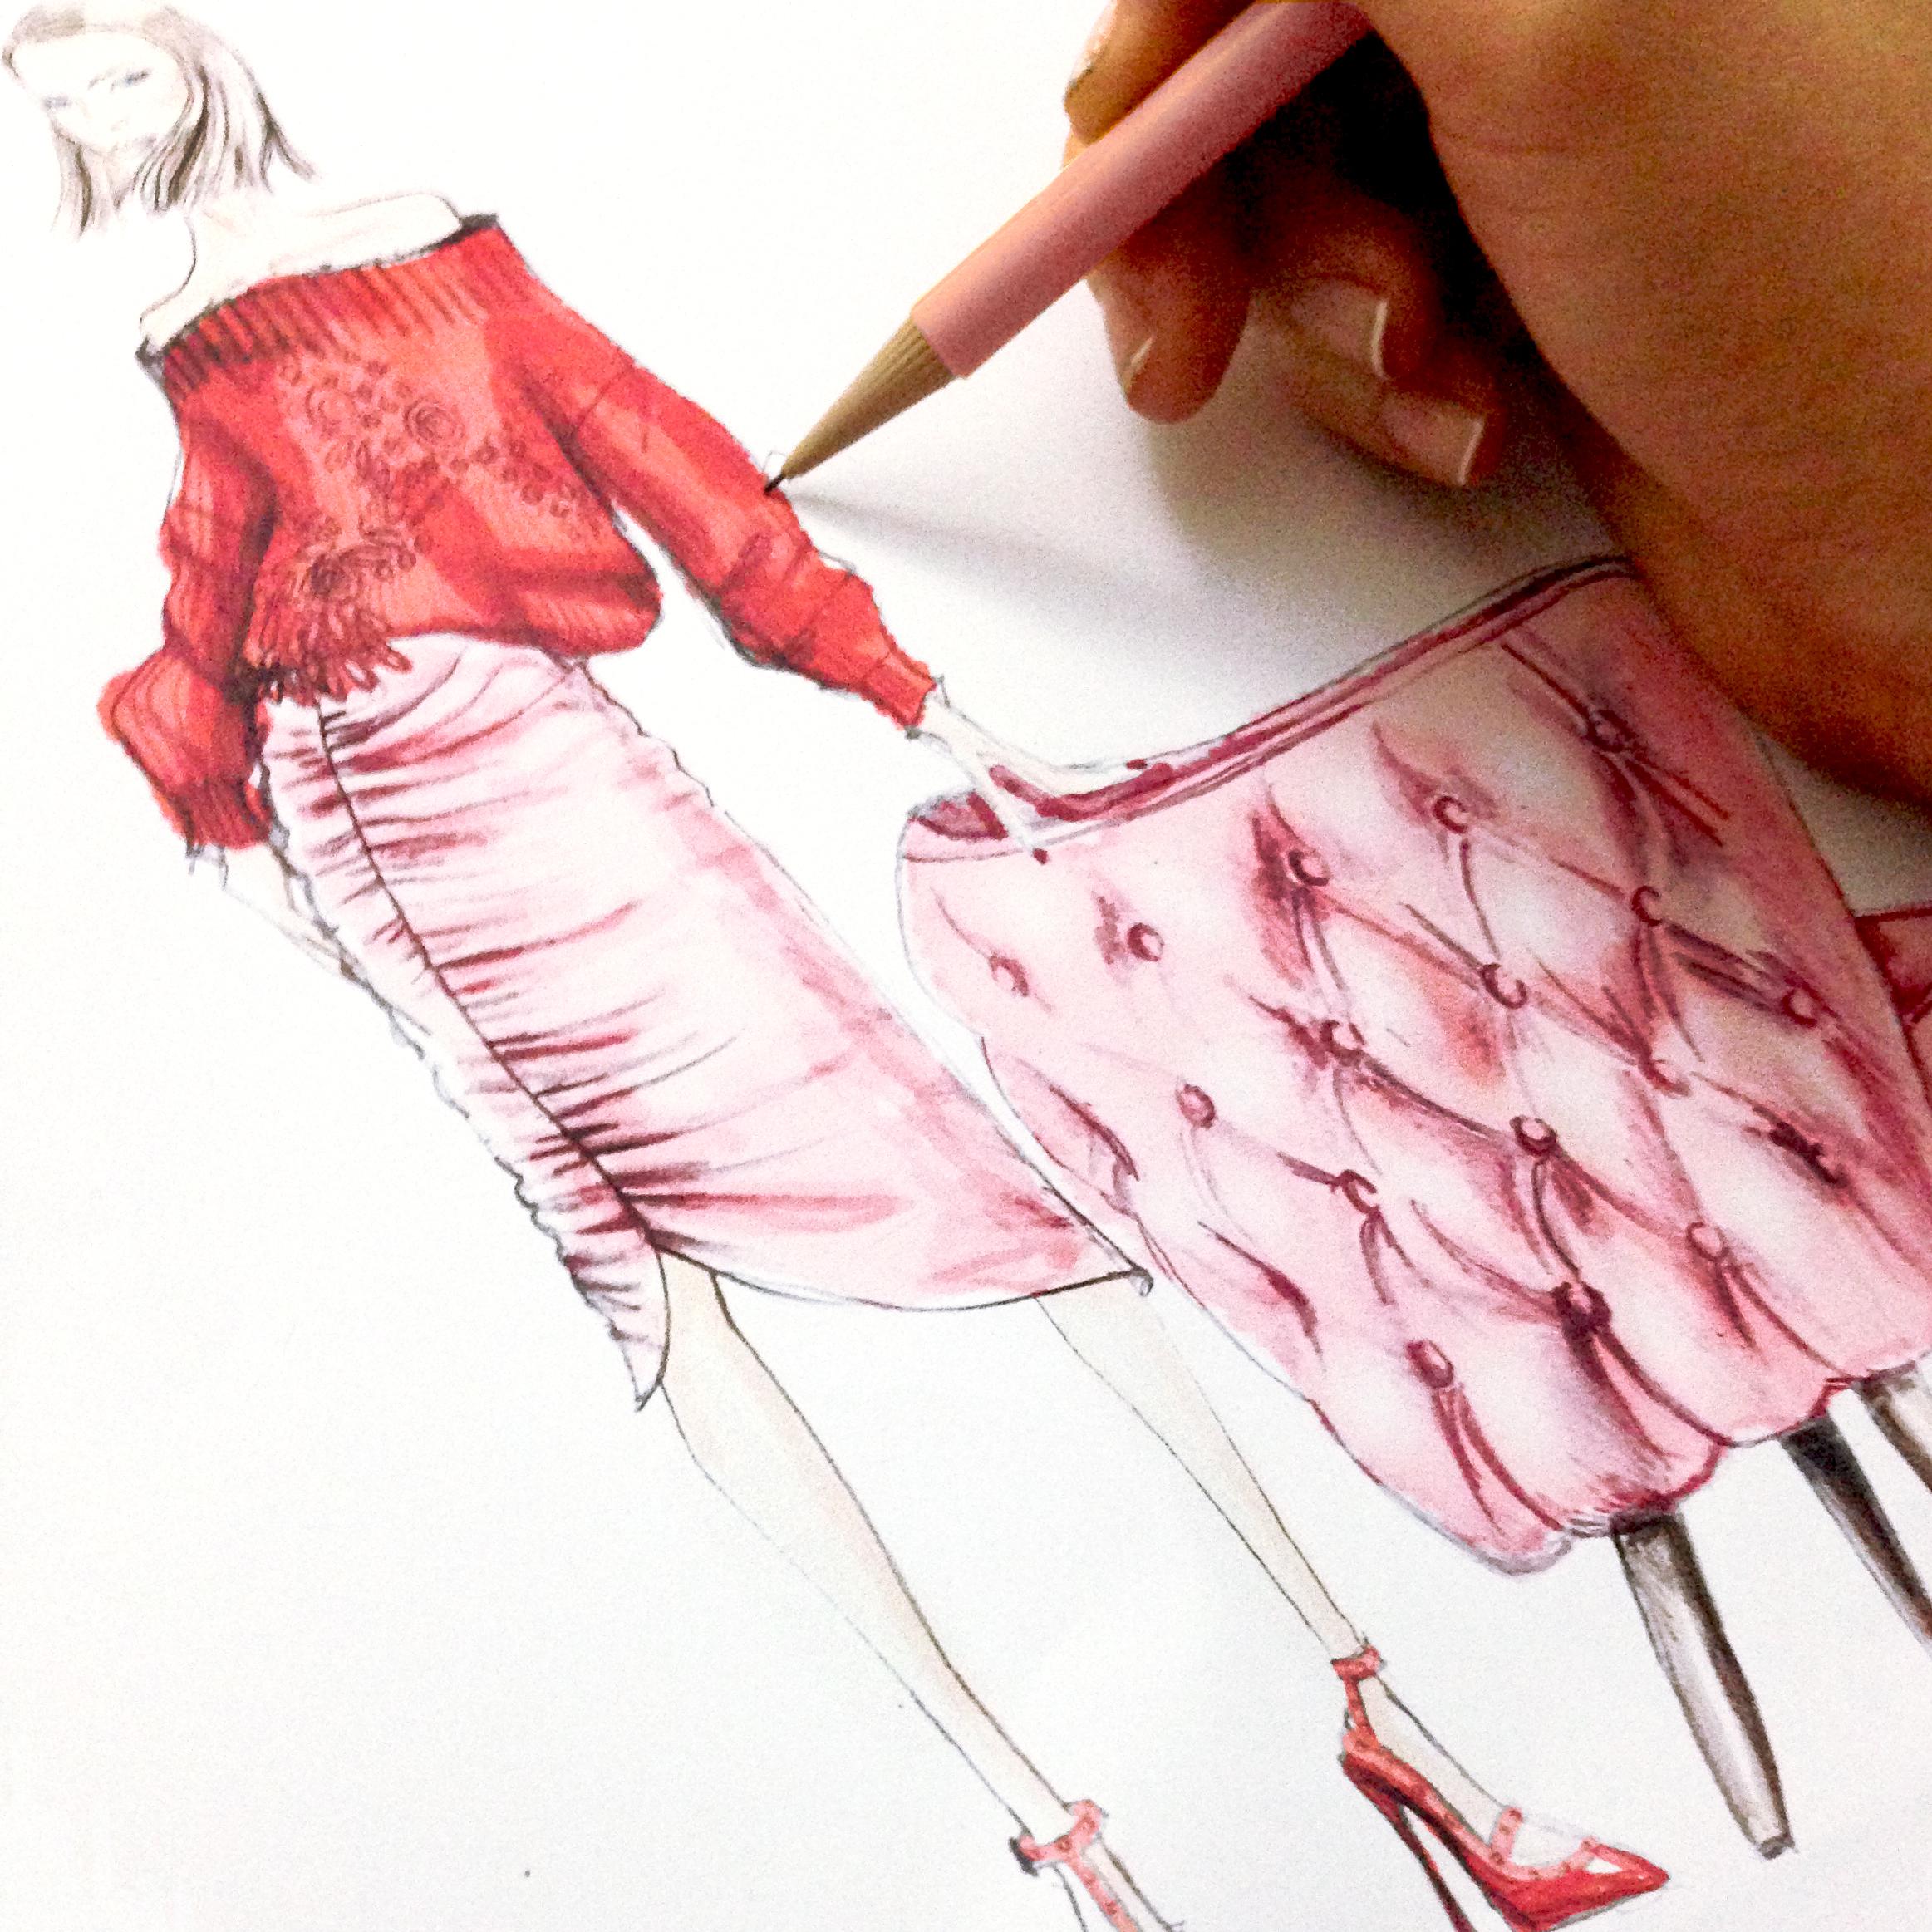 Behind the scenes with Neeshe Illustrator